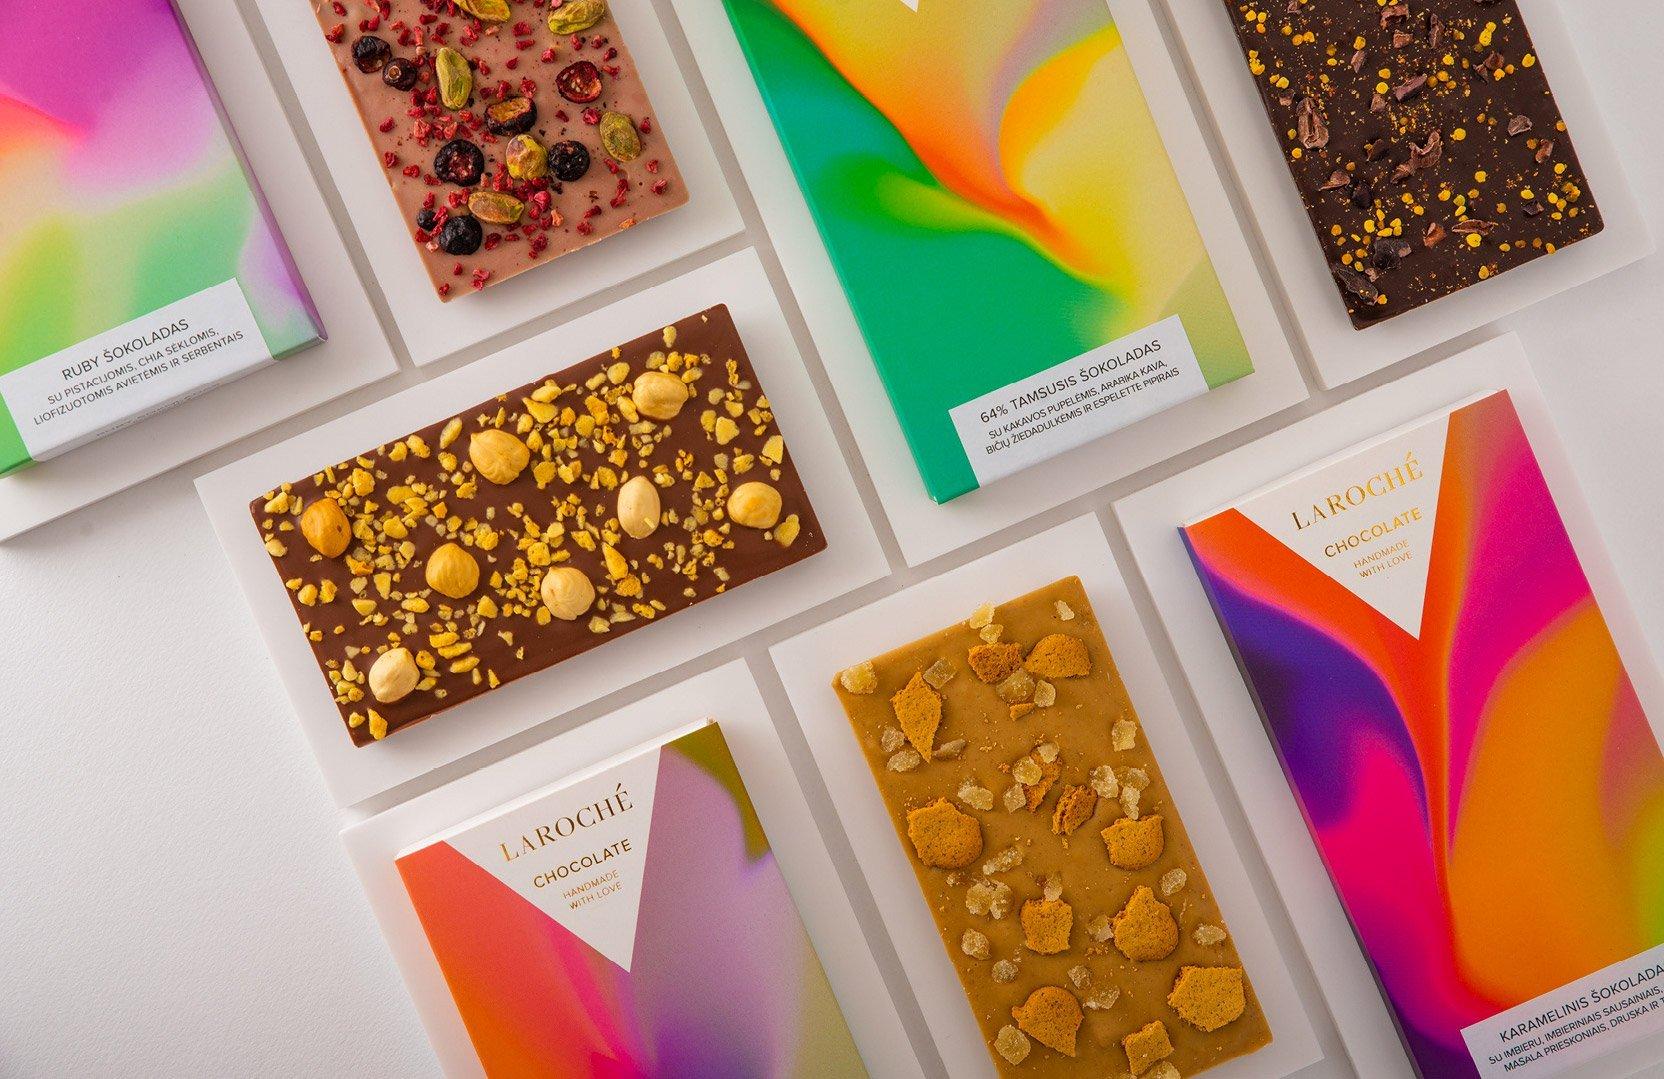 Laroche-Chocolate-Packaging-by-Martin-Naumann-10